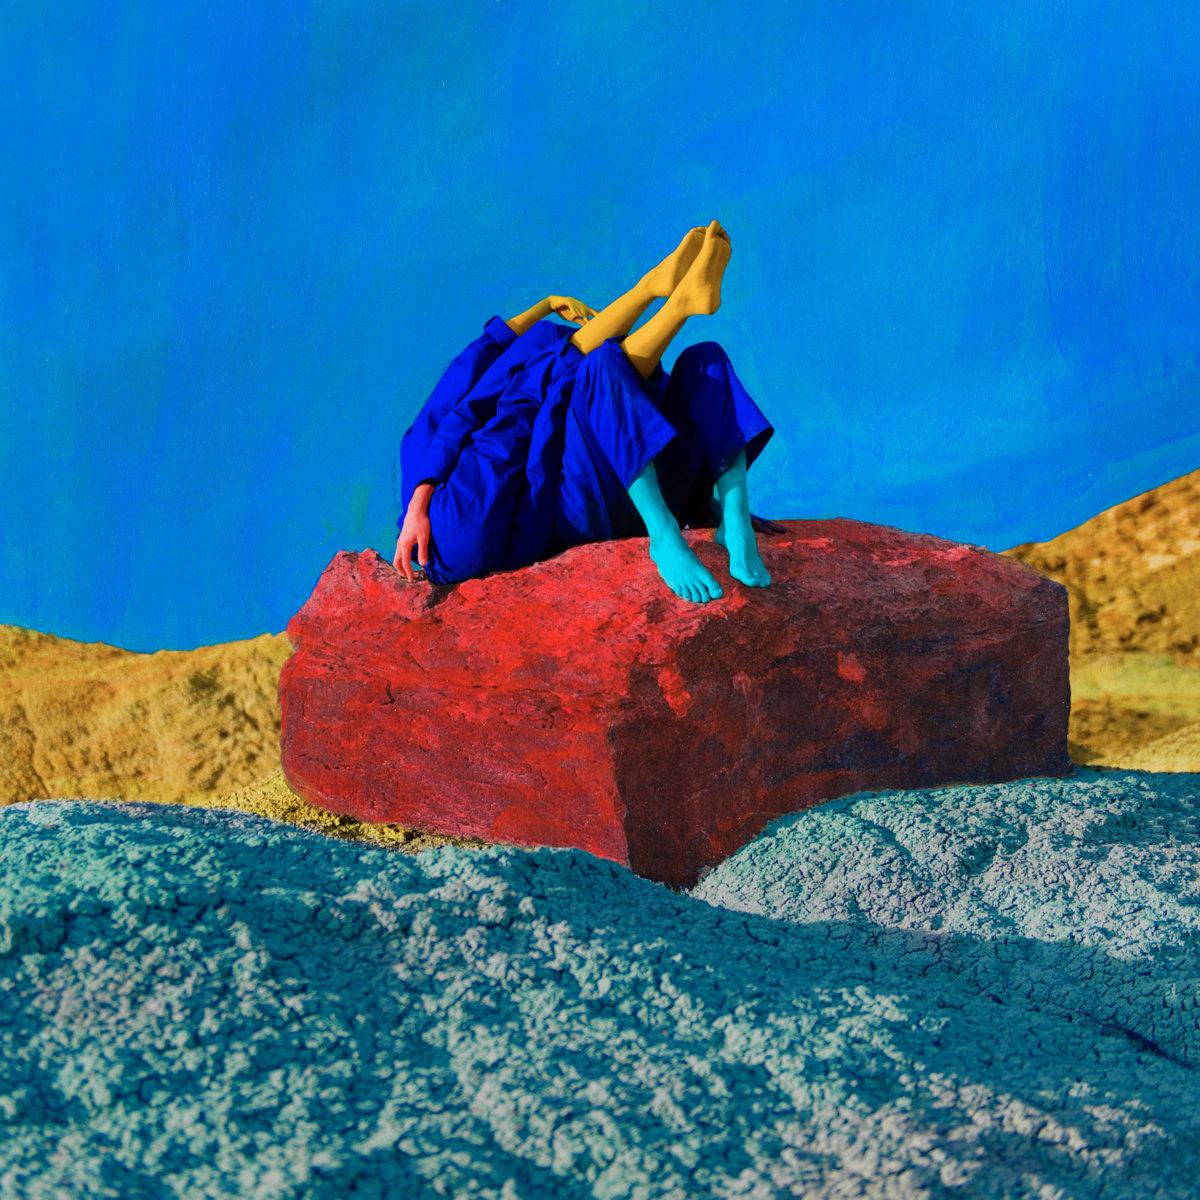 Grey Aura Zwart Vierkant Album Cover Artwork